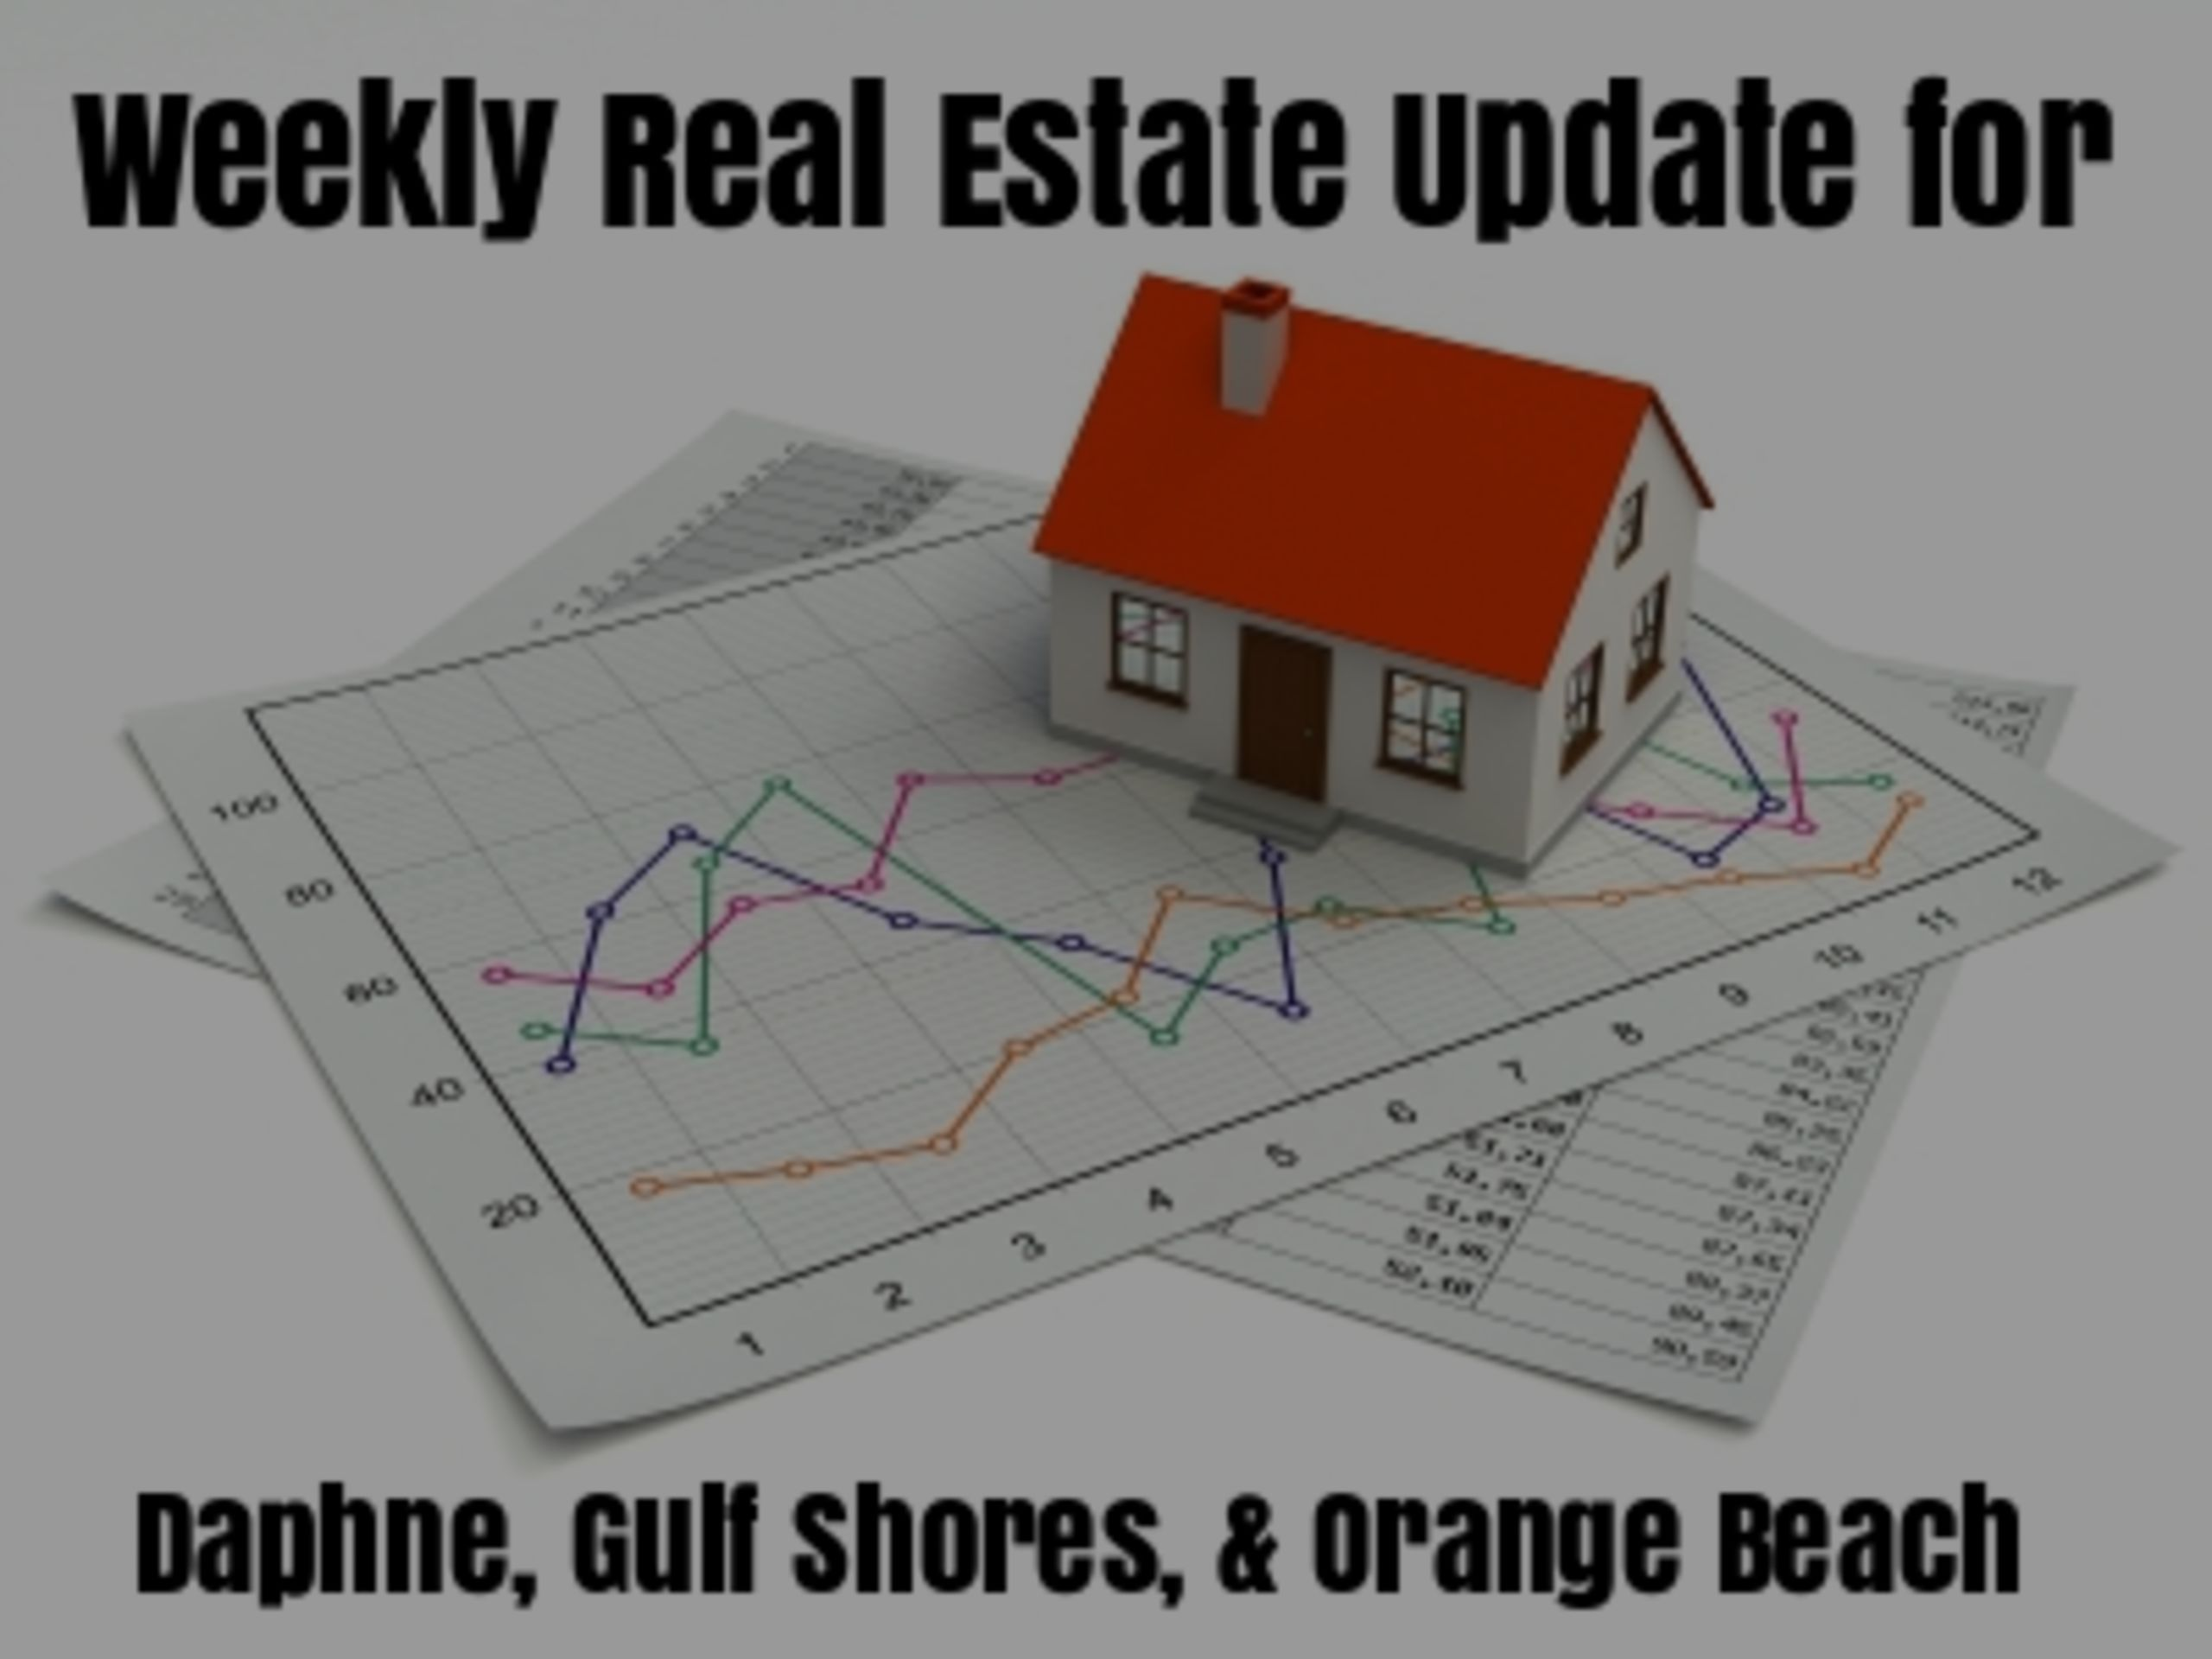 Weekly Real Estate Update – Daphne, Gulf Shores, and Orange Beach – 10/16/17